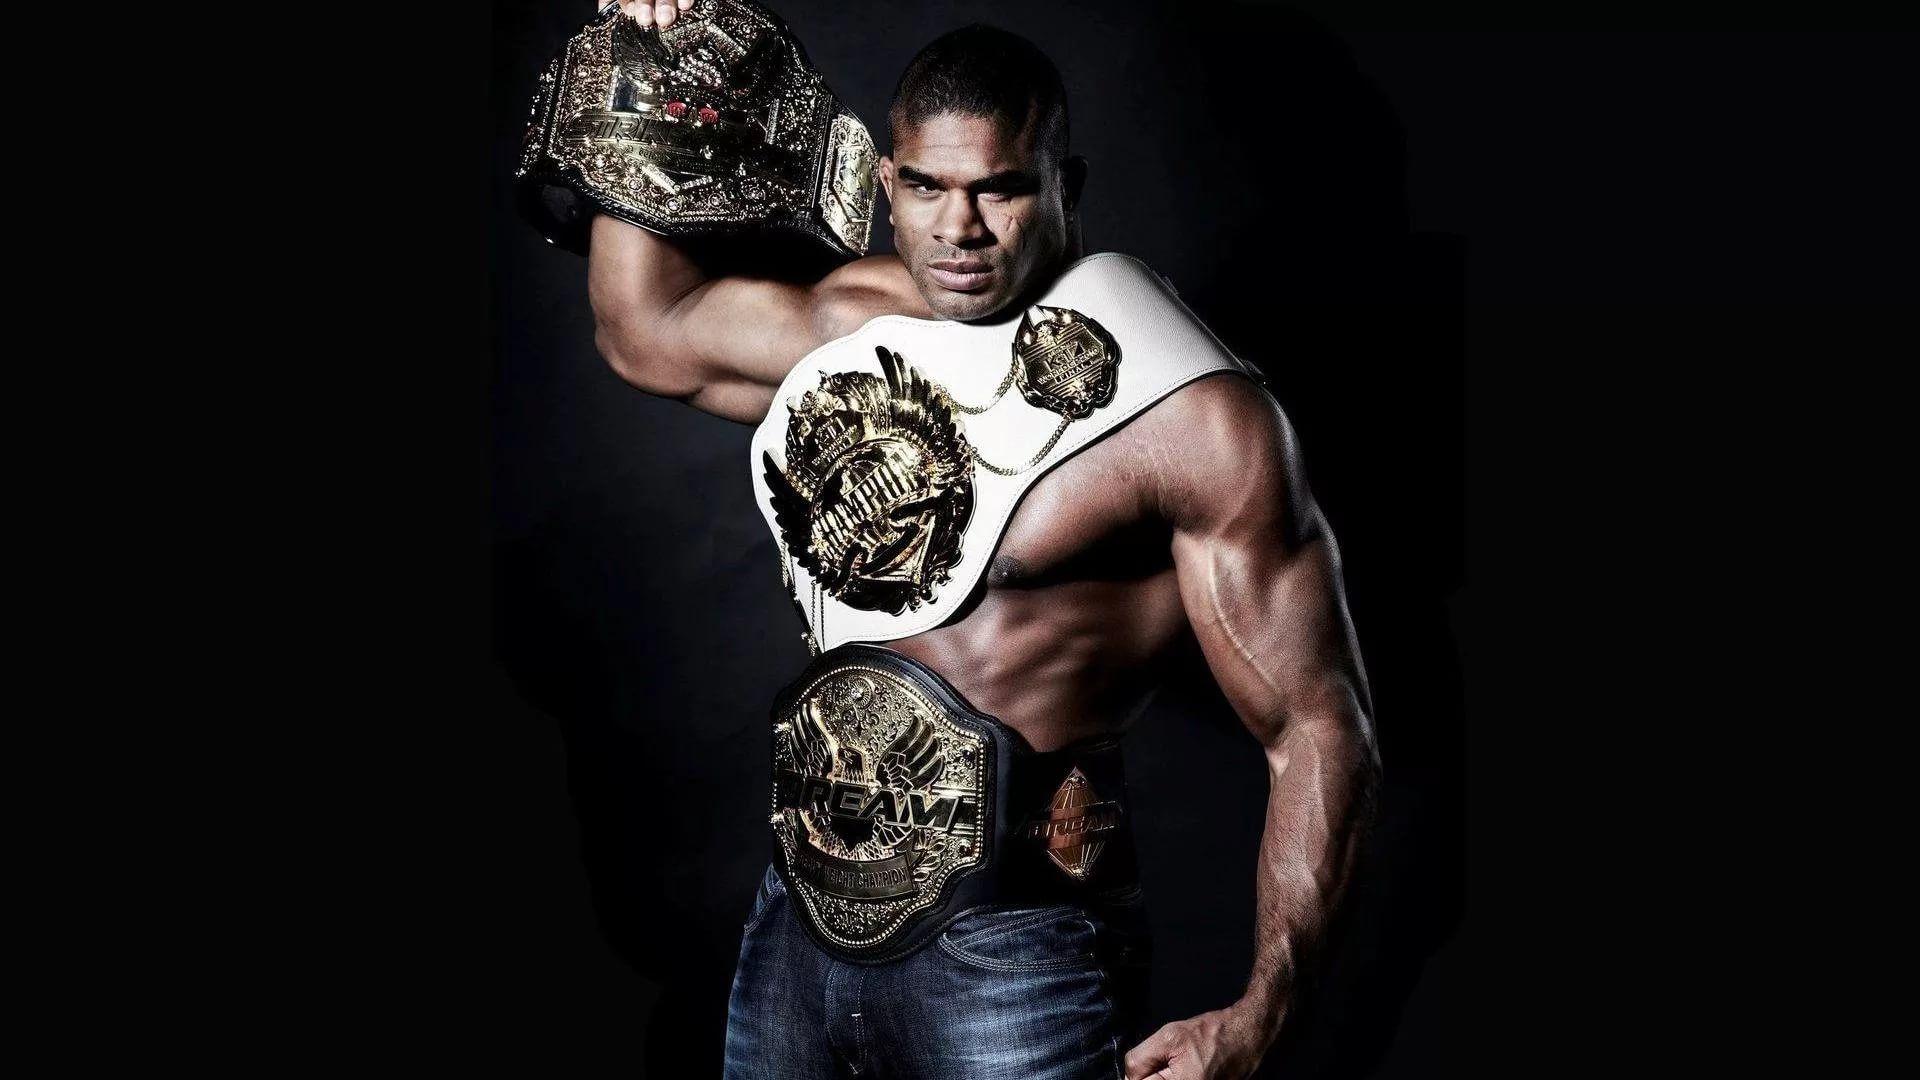 MMA Wallpaper Image